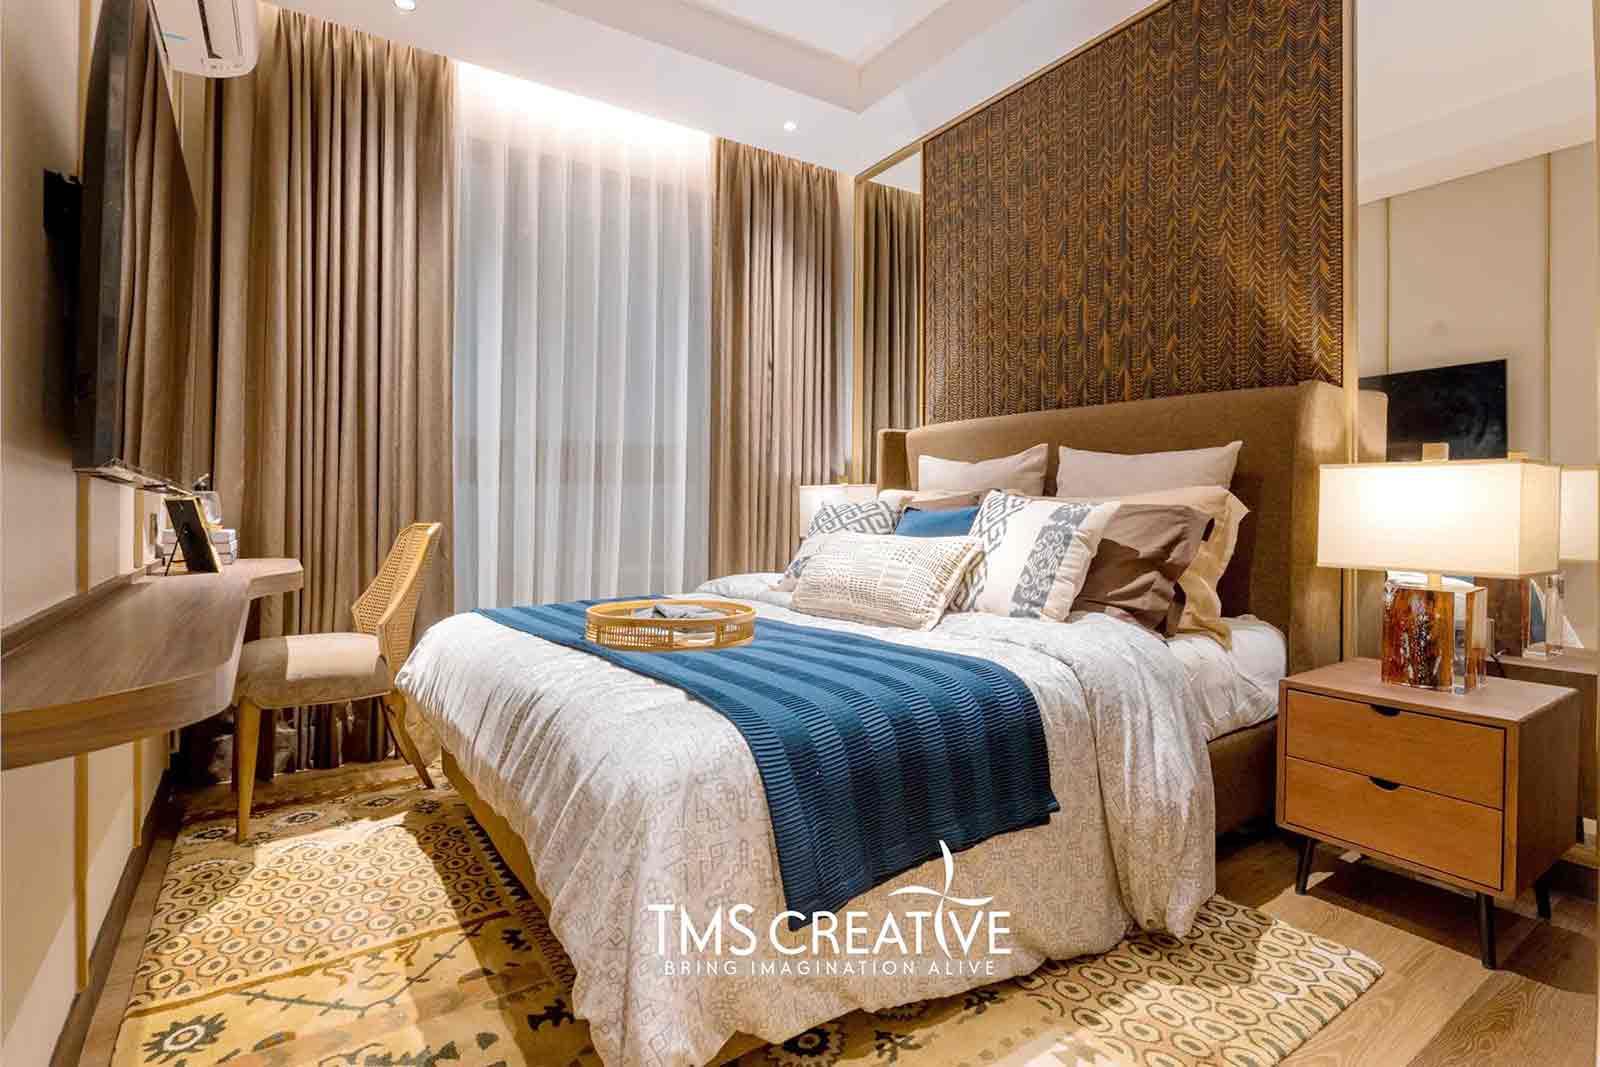 Warna cerah desain interior kamar tidur karya TMS Creative, via arsitag.com